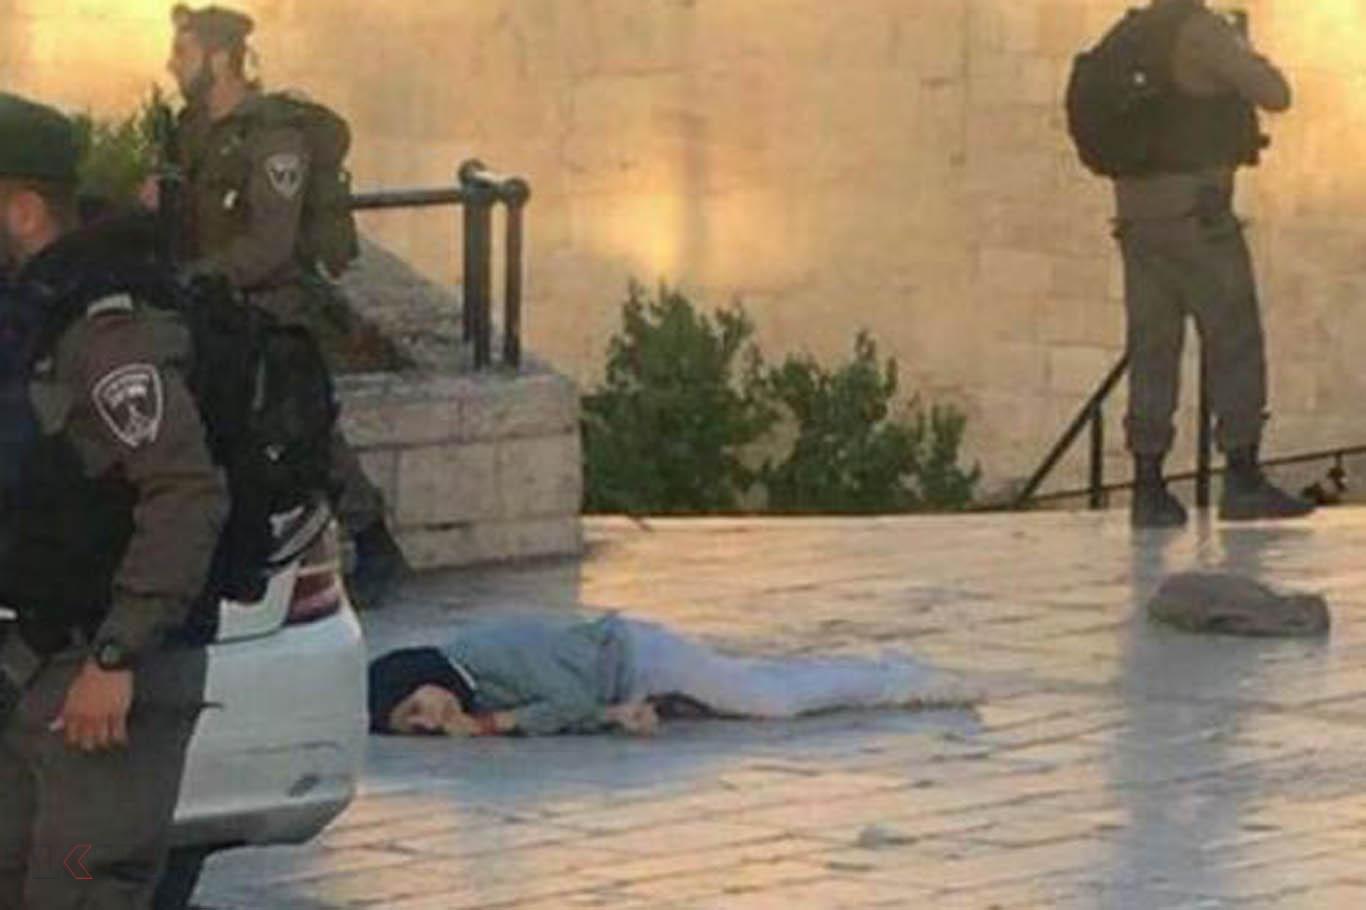 Siyonist polisler Filistinli kızı katletti